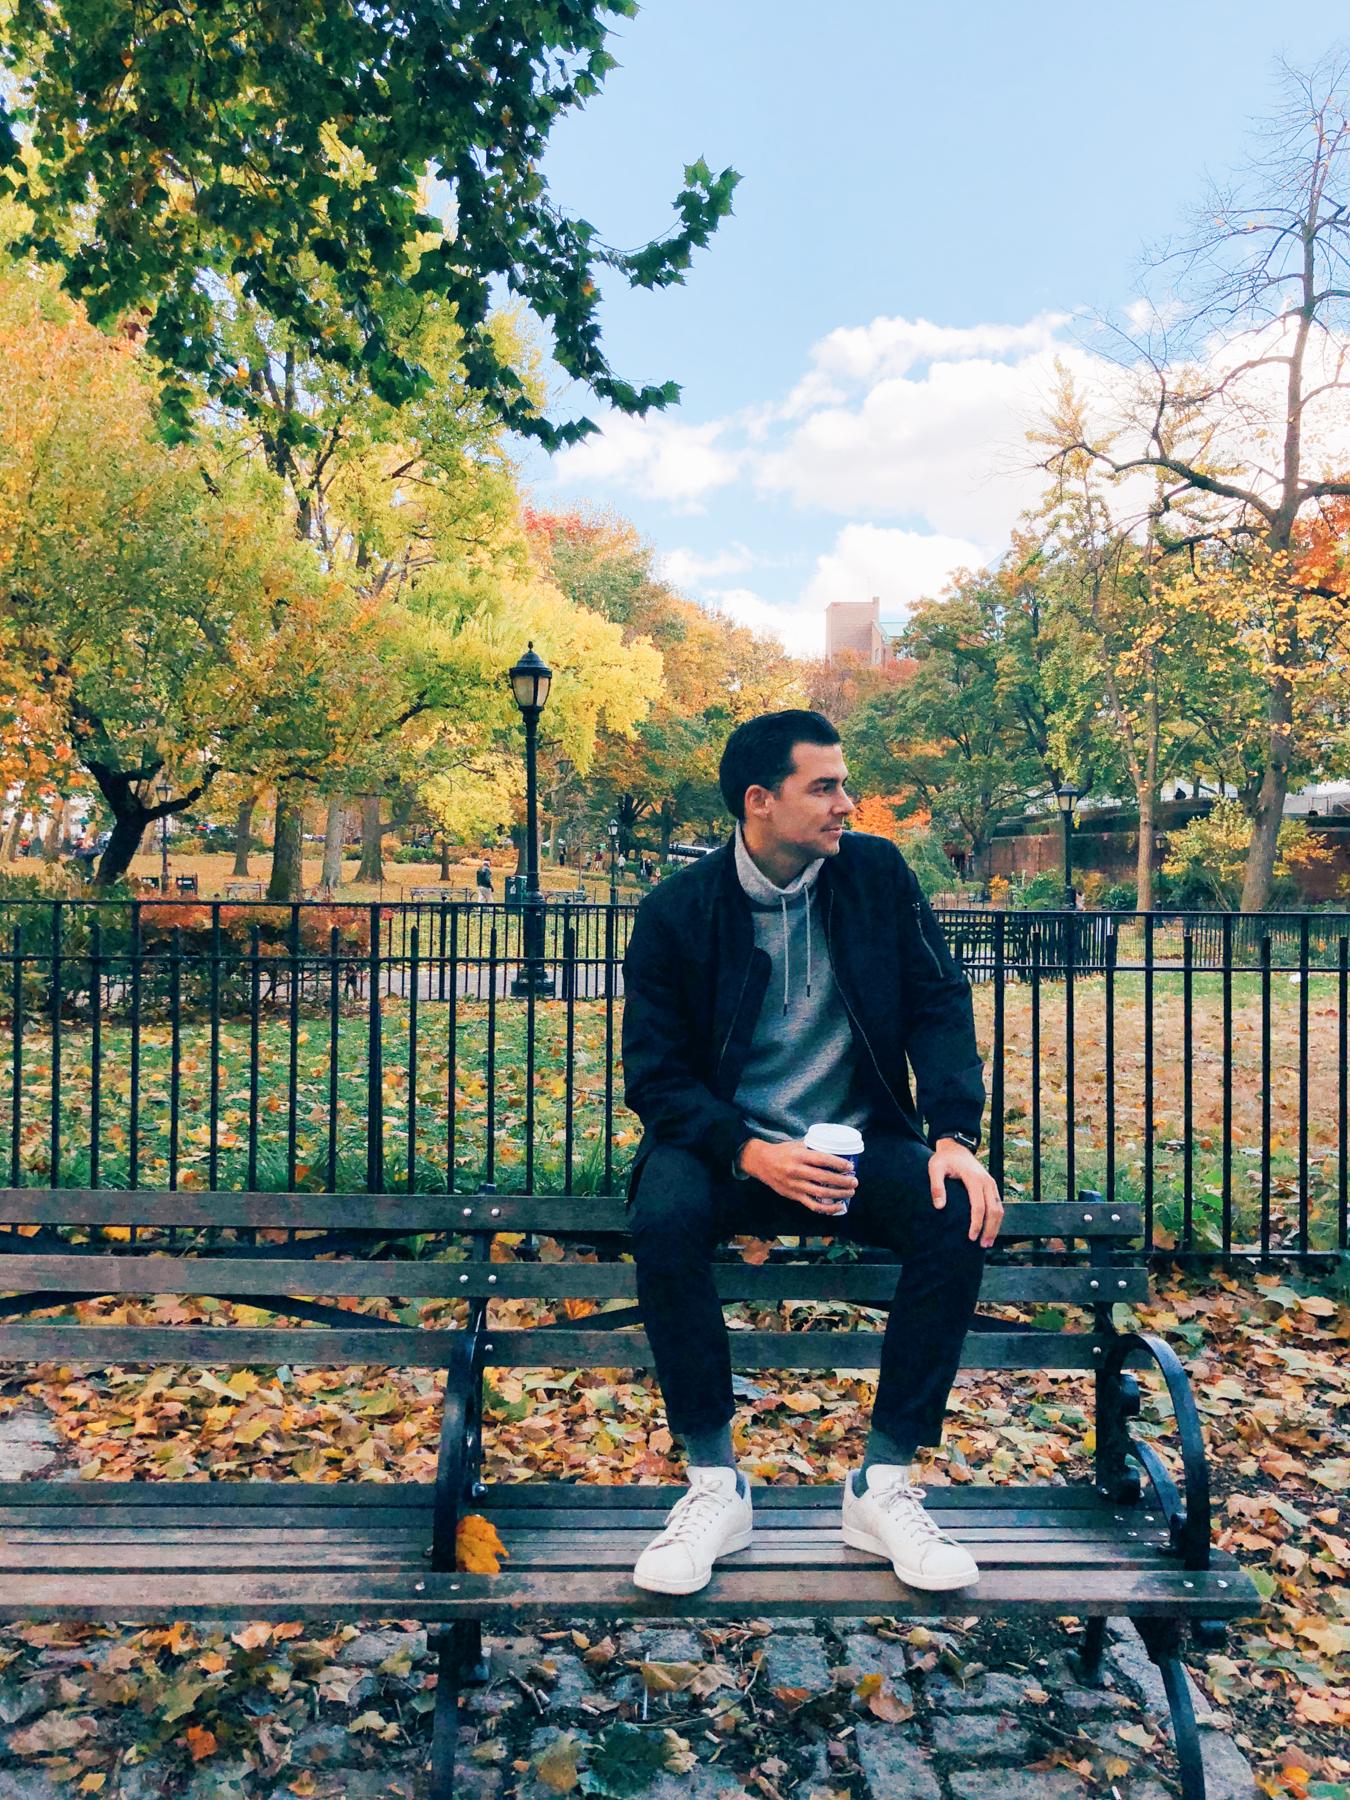 Theodore Roosevelt Park